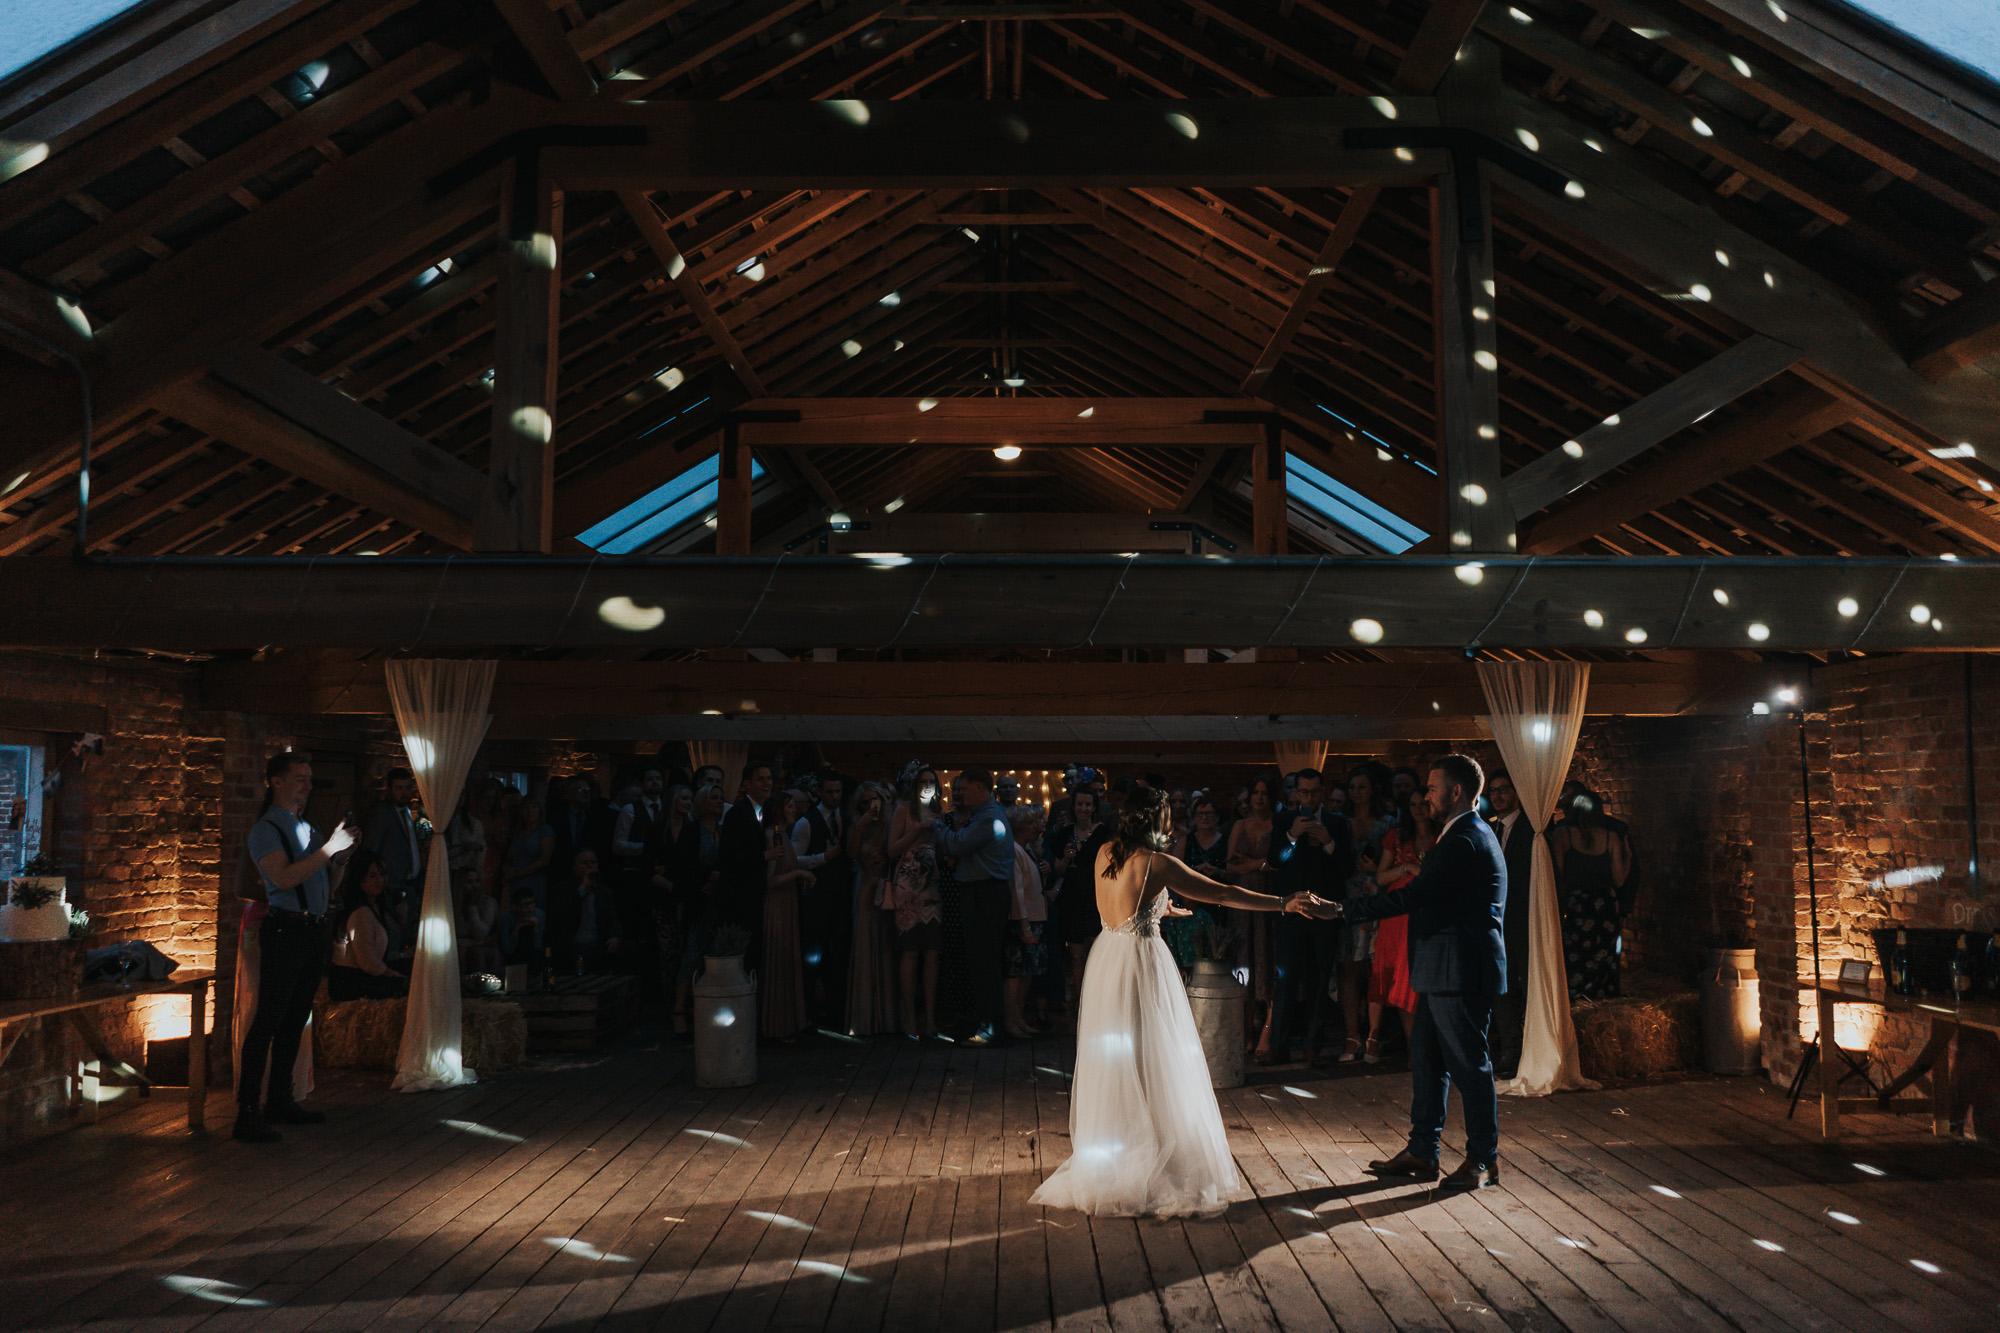 farm wedding in cheshire wedding photographer based in liverpool  (36 of 36).jpg